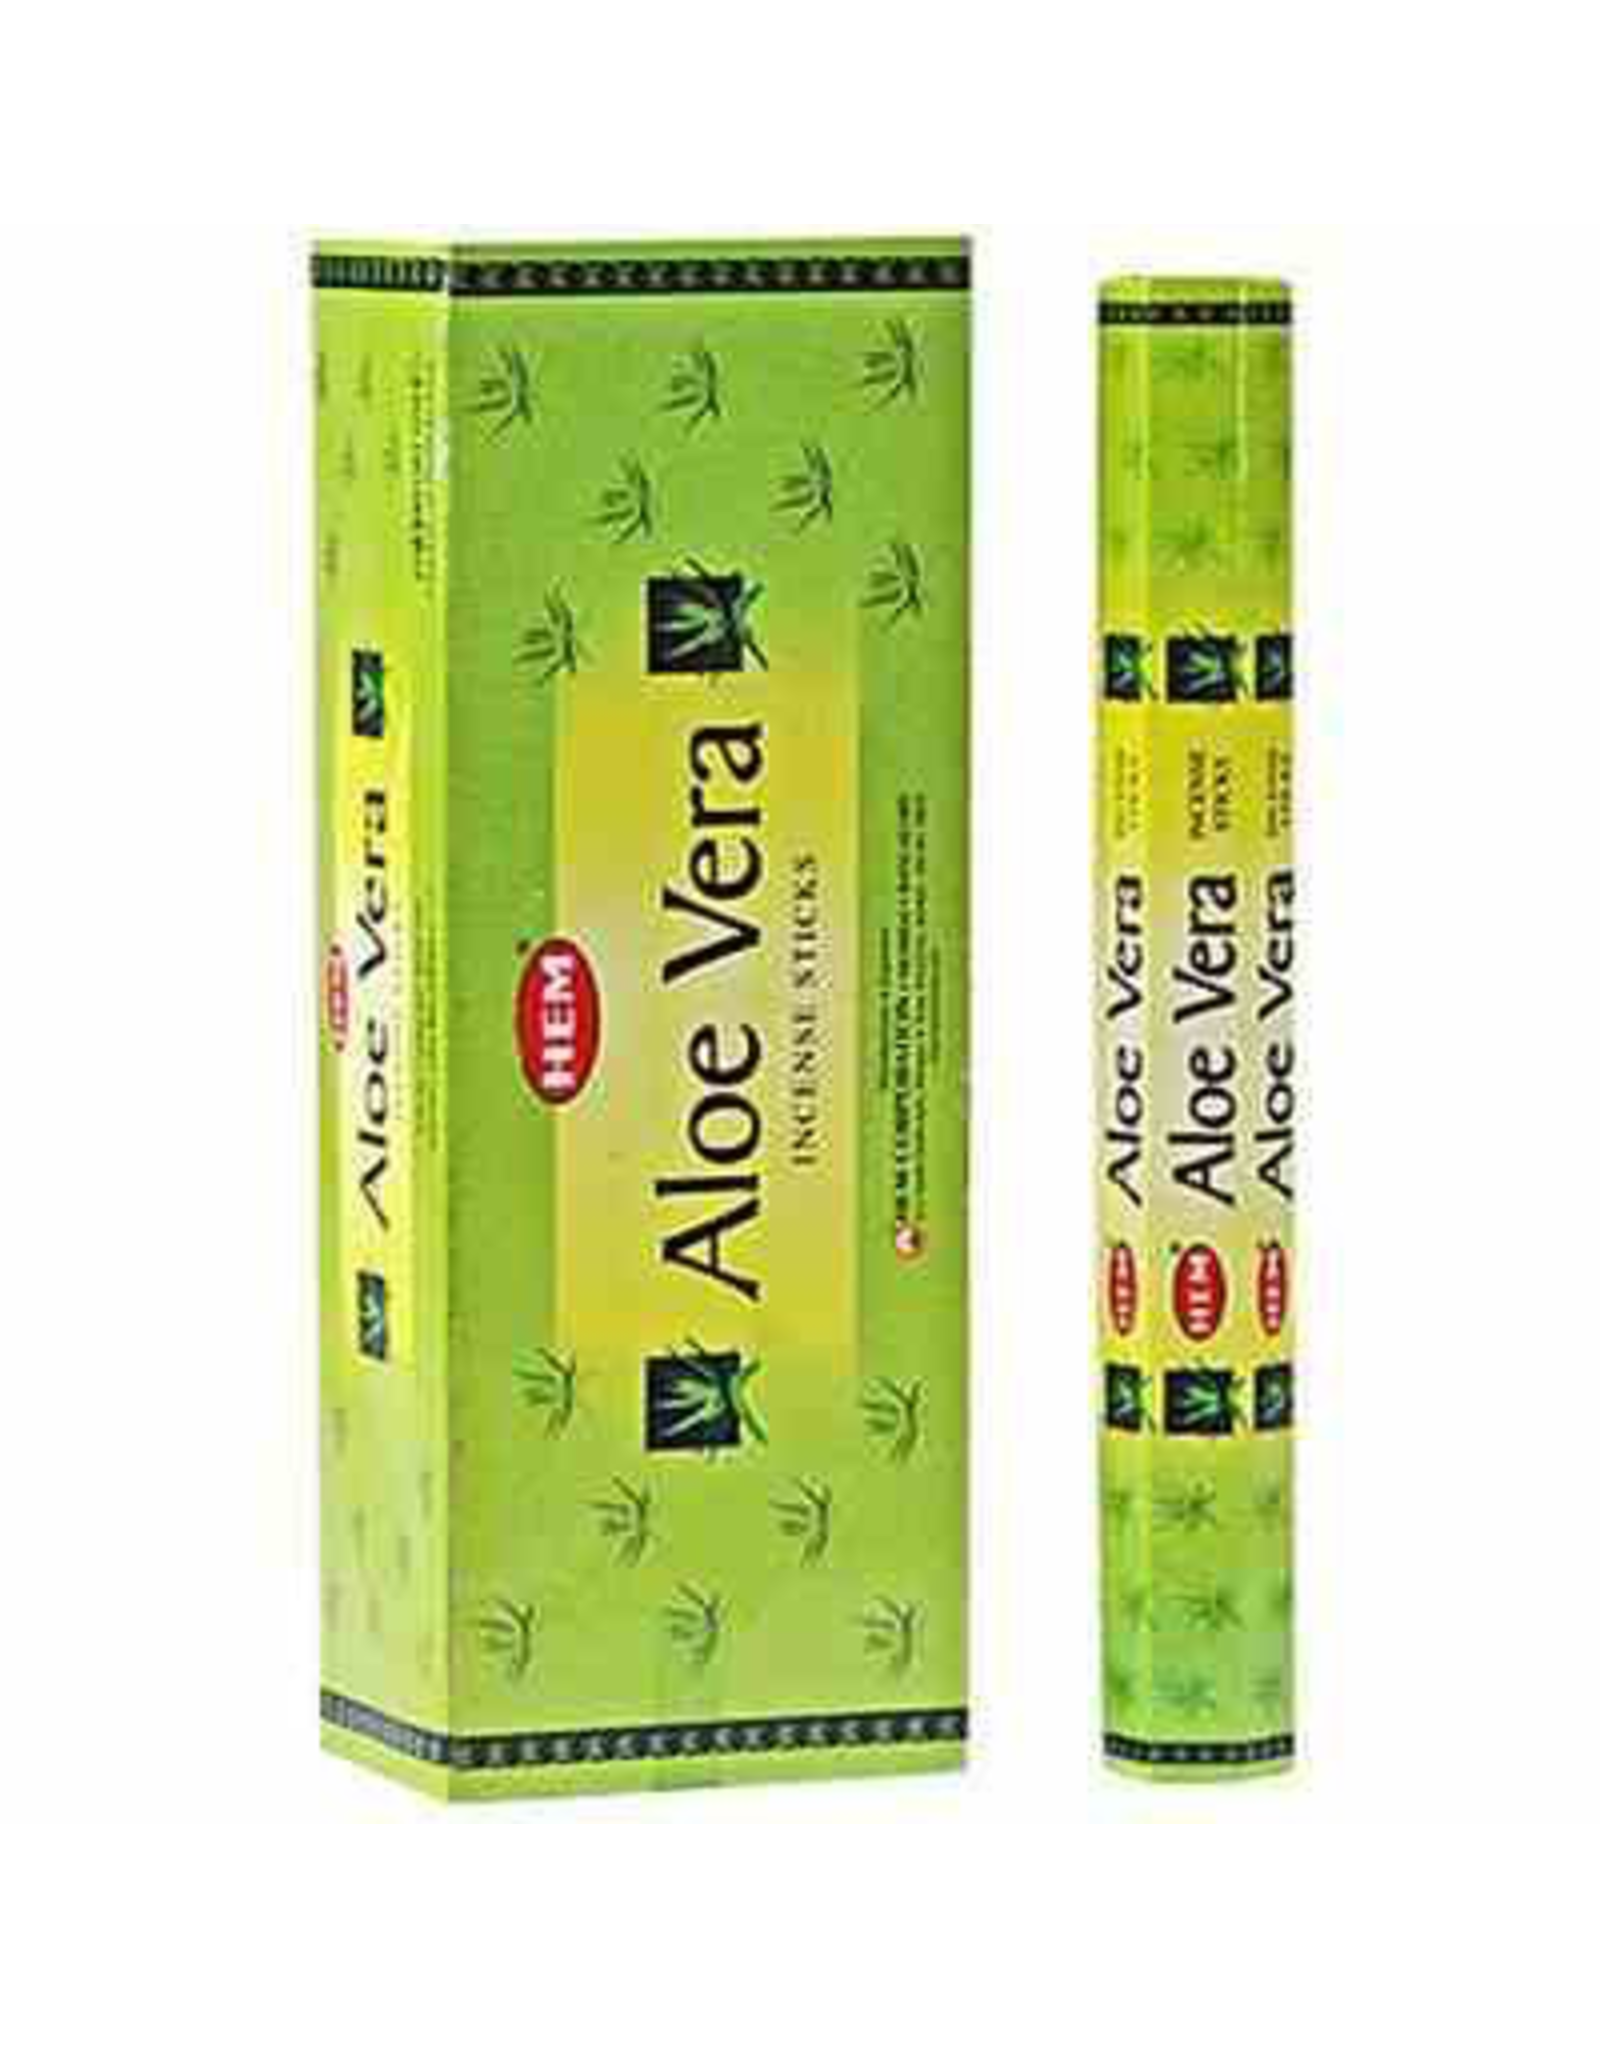 HEM 20 Gram Aloe Vera Hex Box Incense